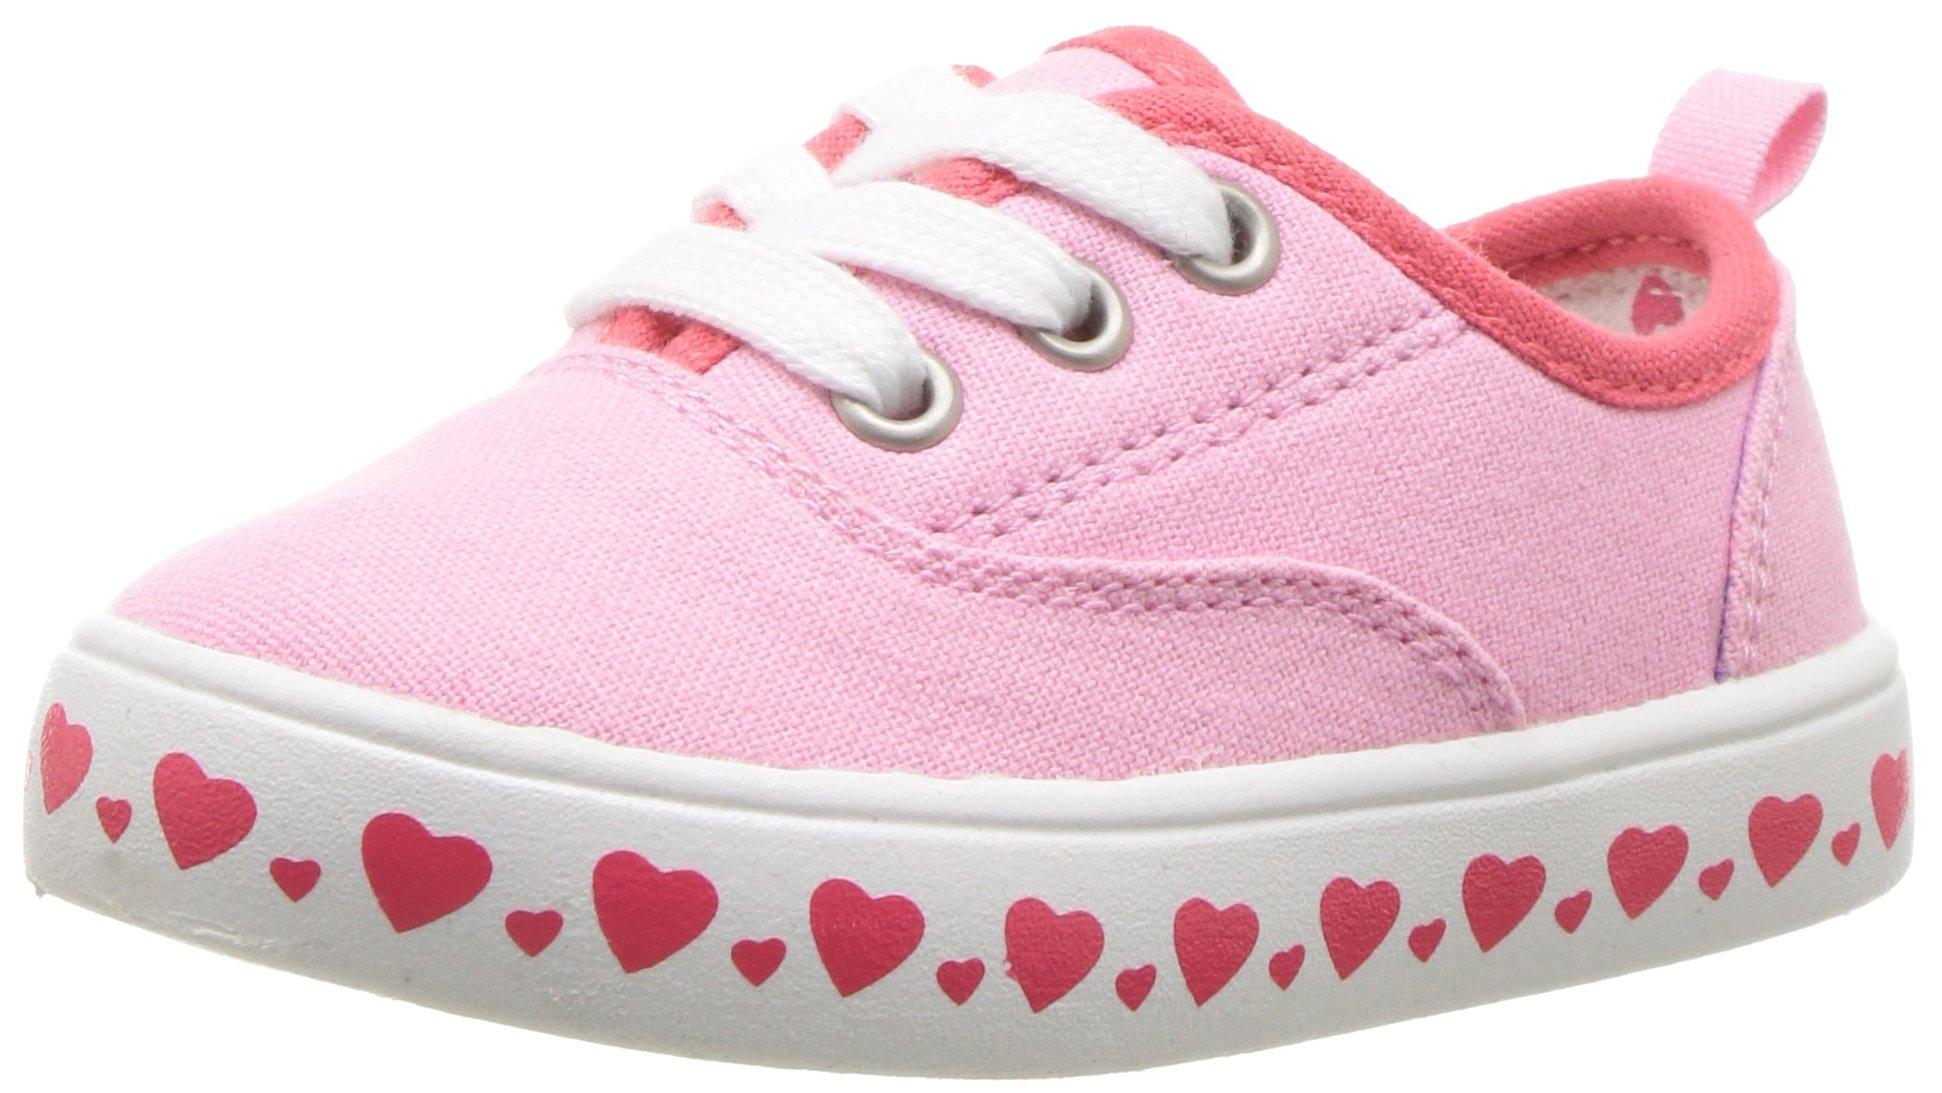 Carter's Austina Girl's Casual Sneaker, Pink, 7 M